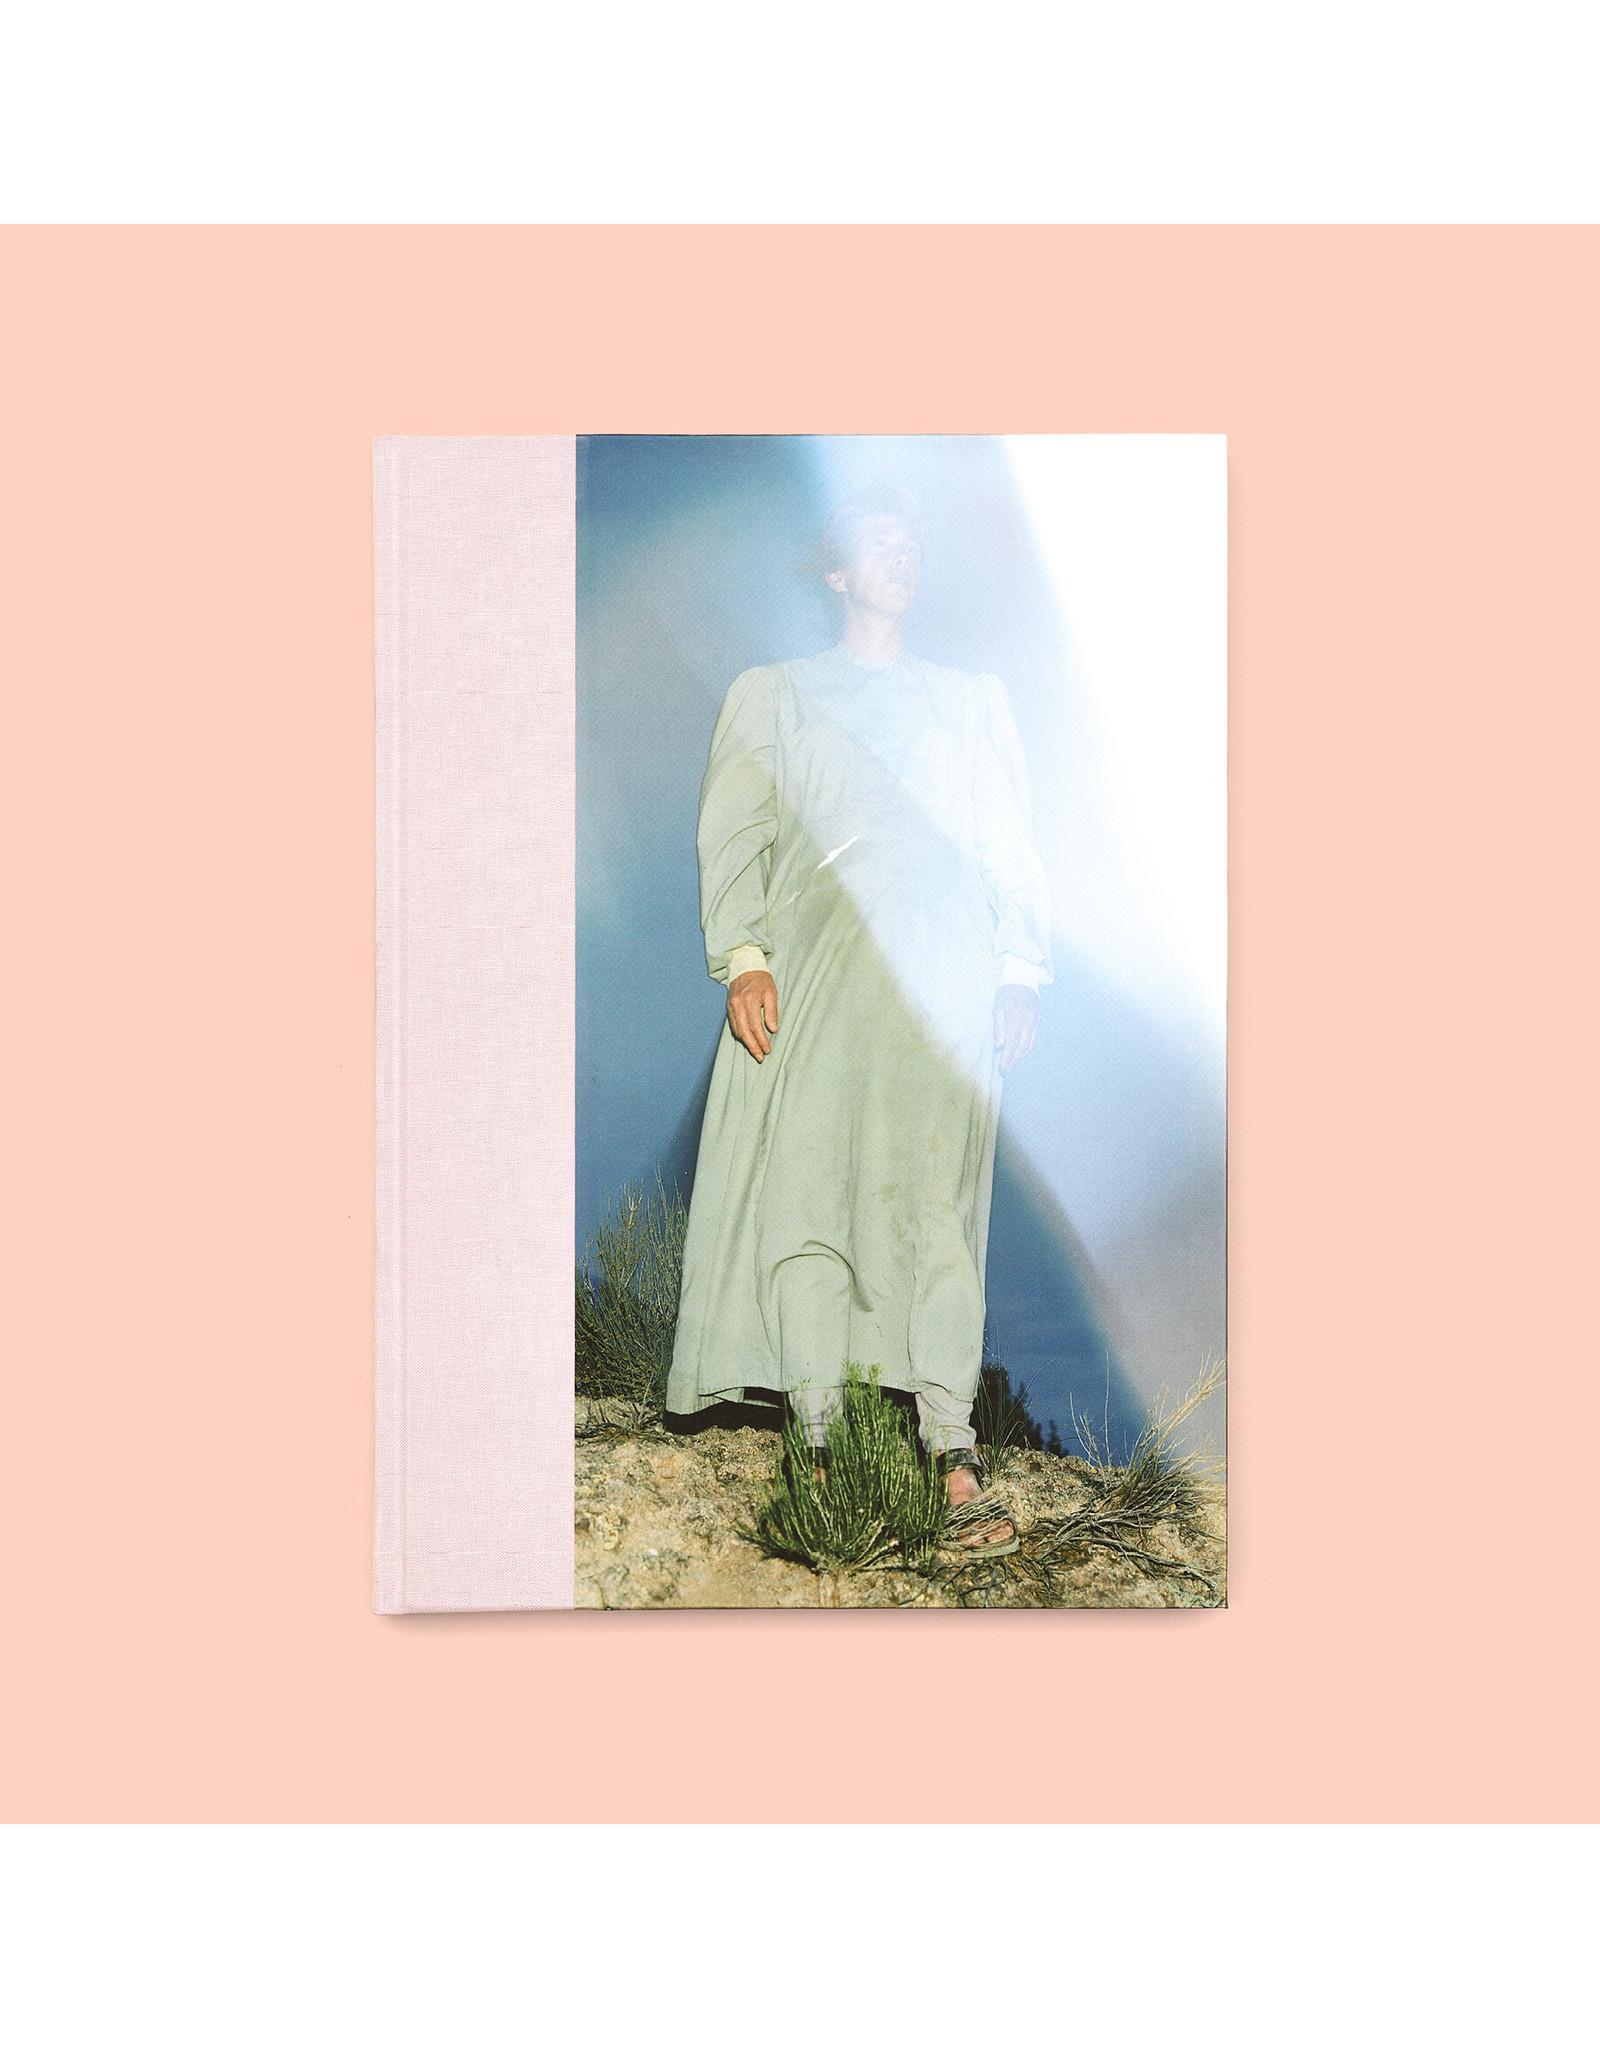 Tanyth Berkeley: The Walking Woman